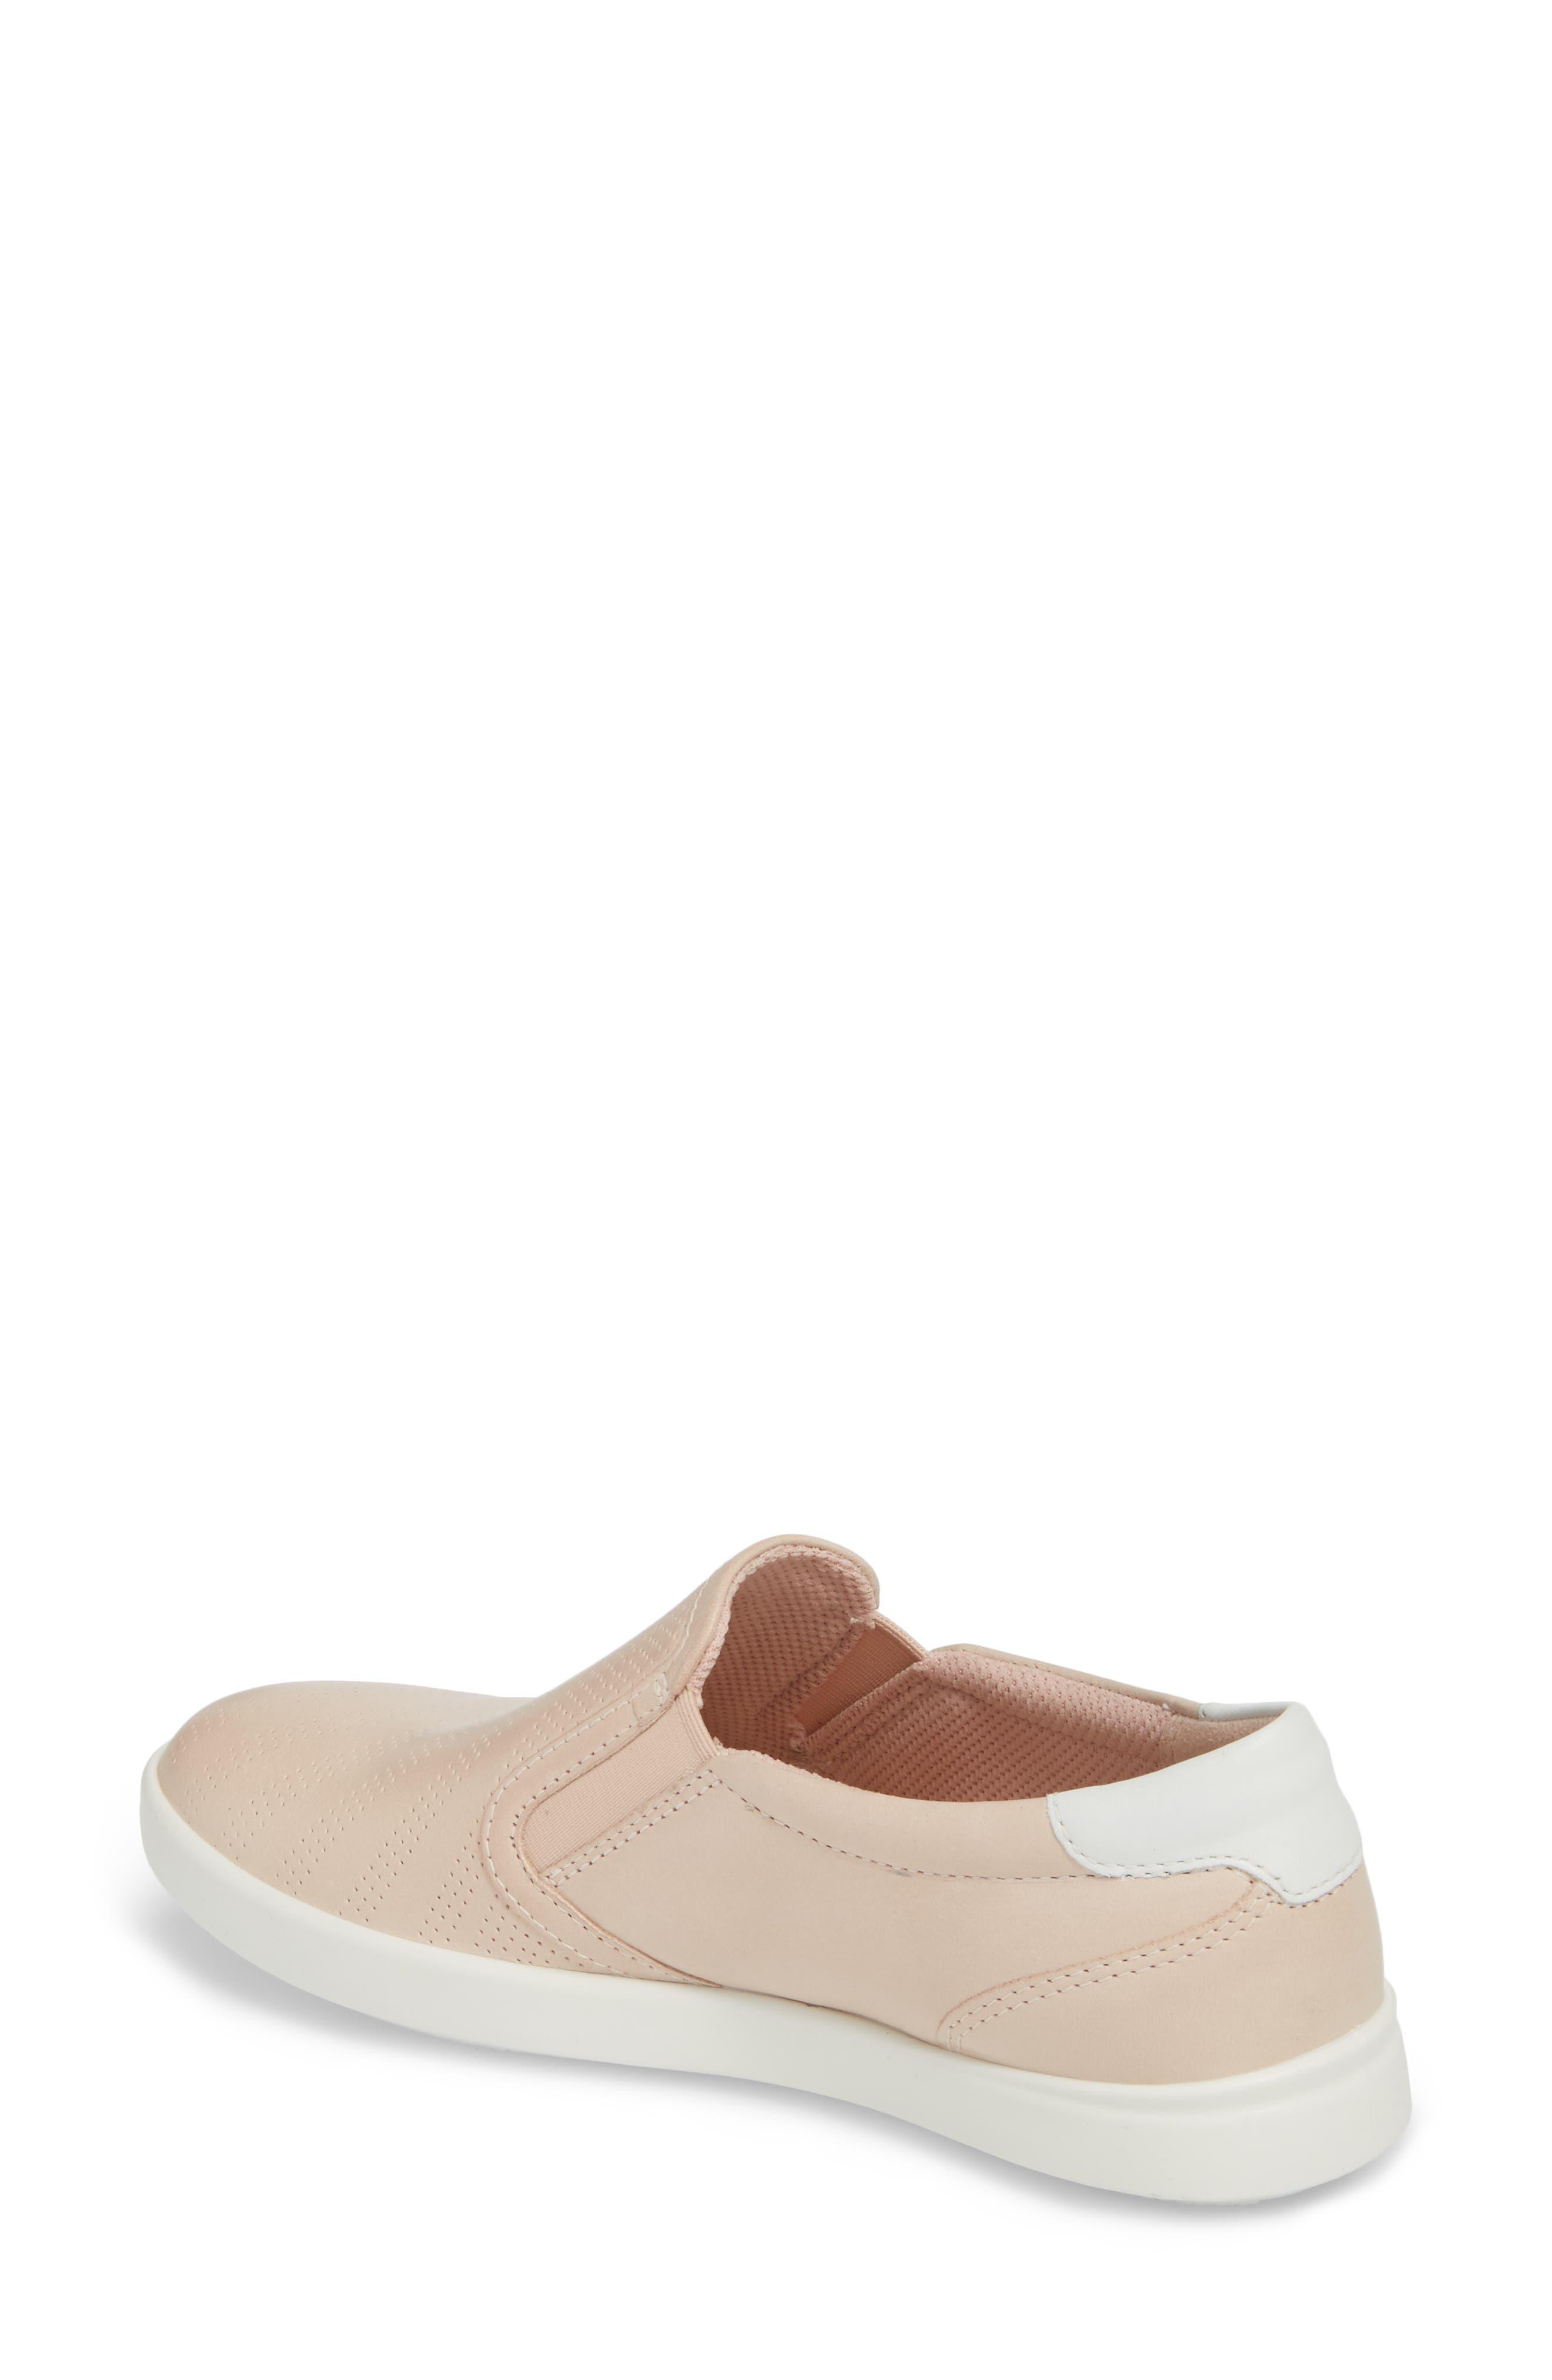 'Aimee' Slip-On Sneaker,                             Alternate thumbnail 2, color,                             Rose Dust Leather